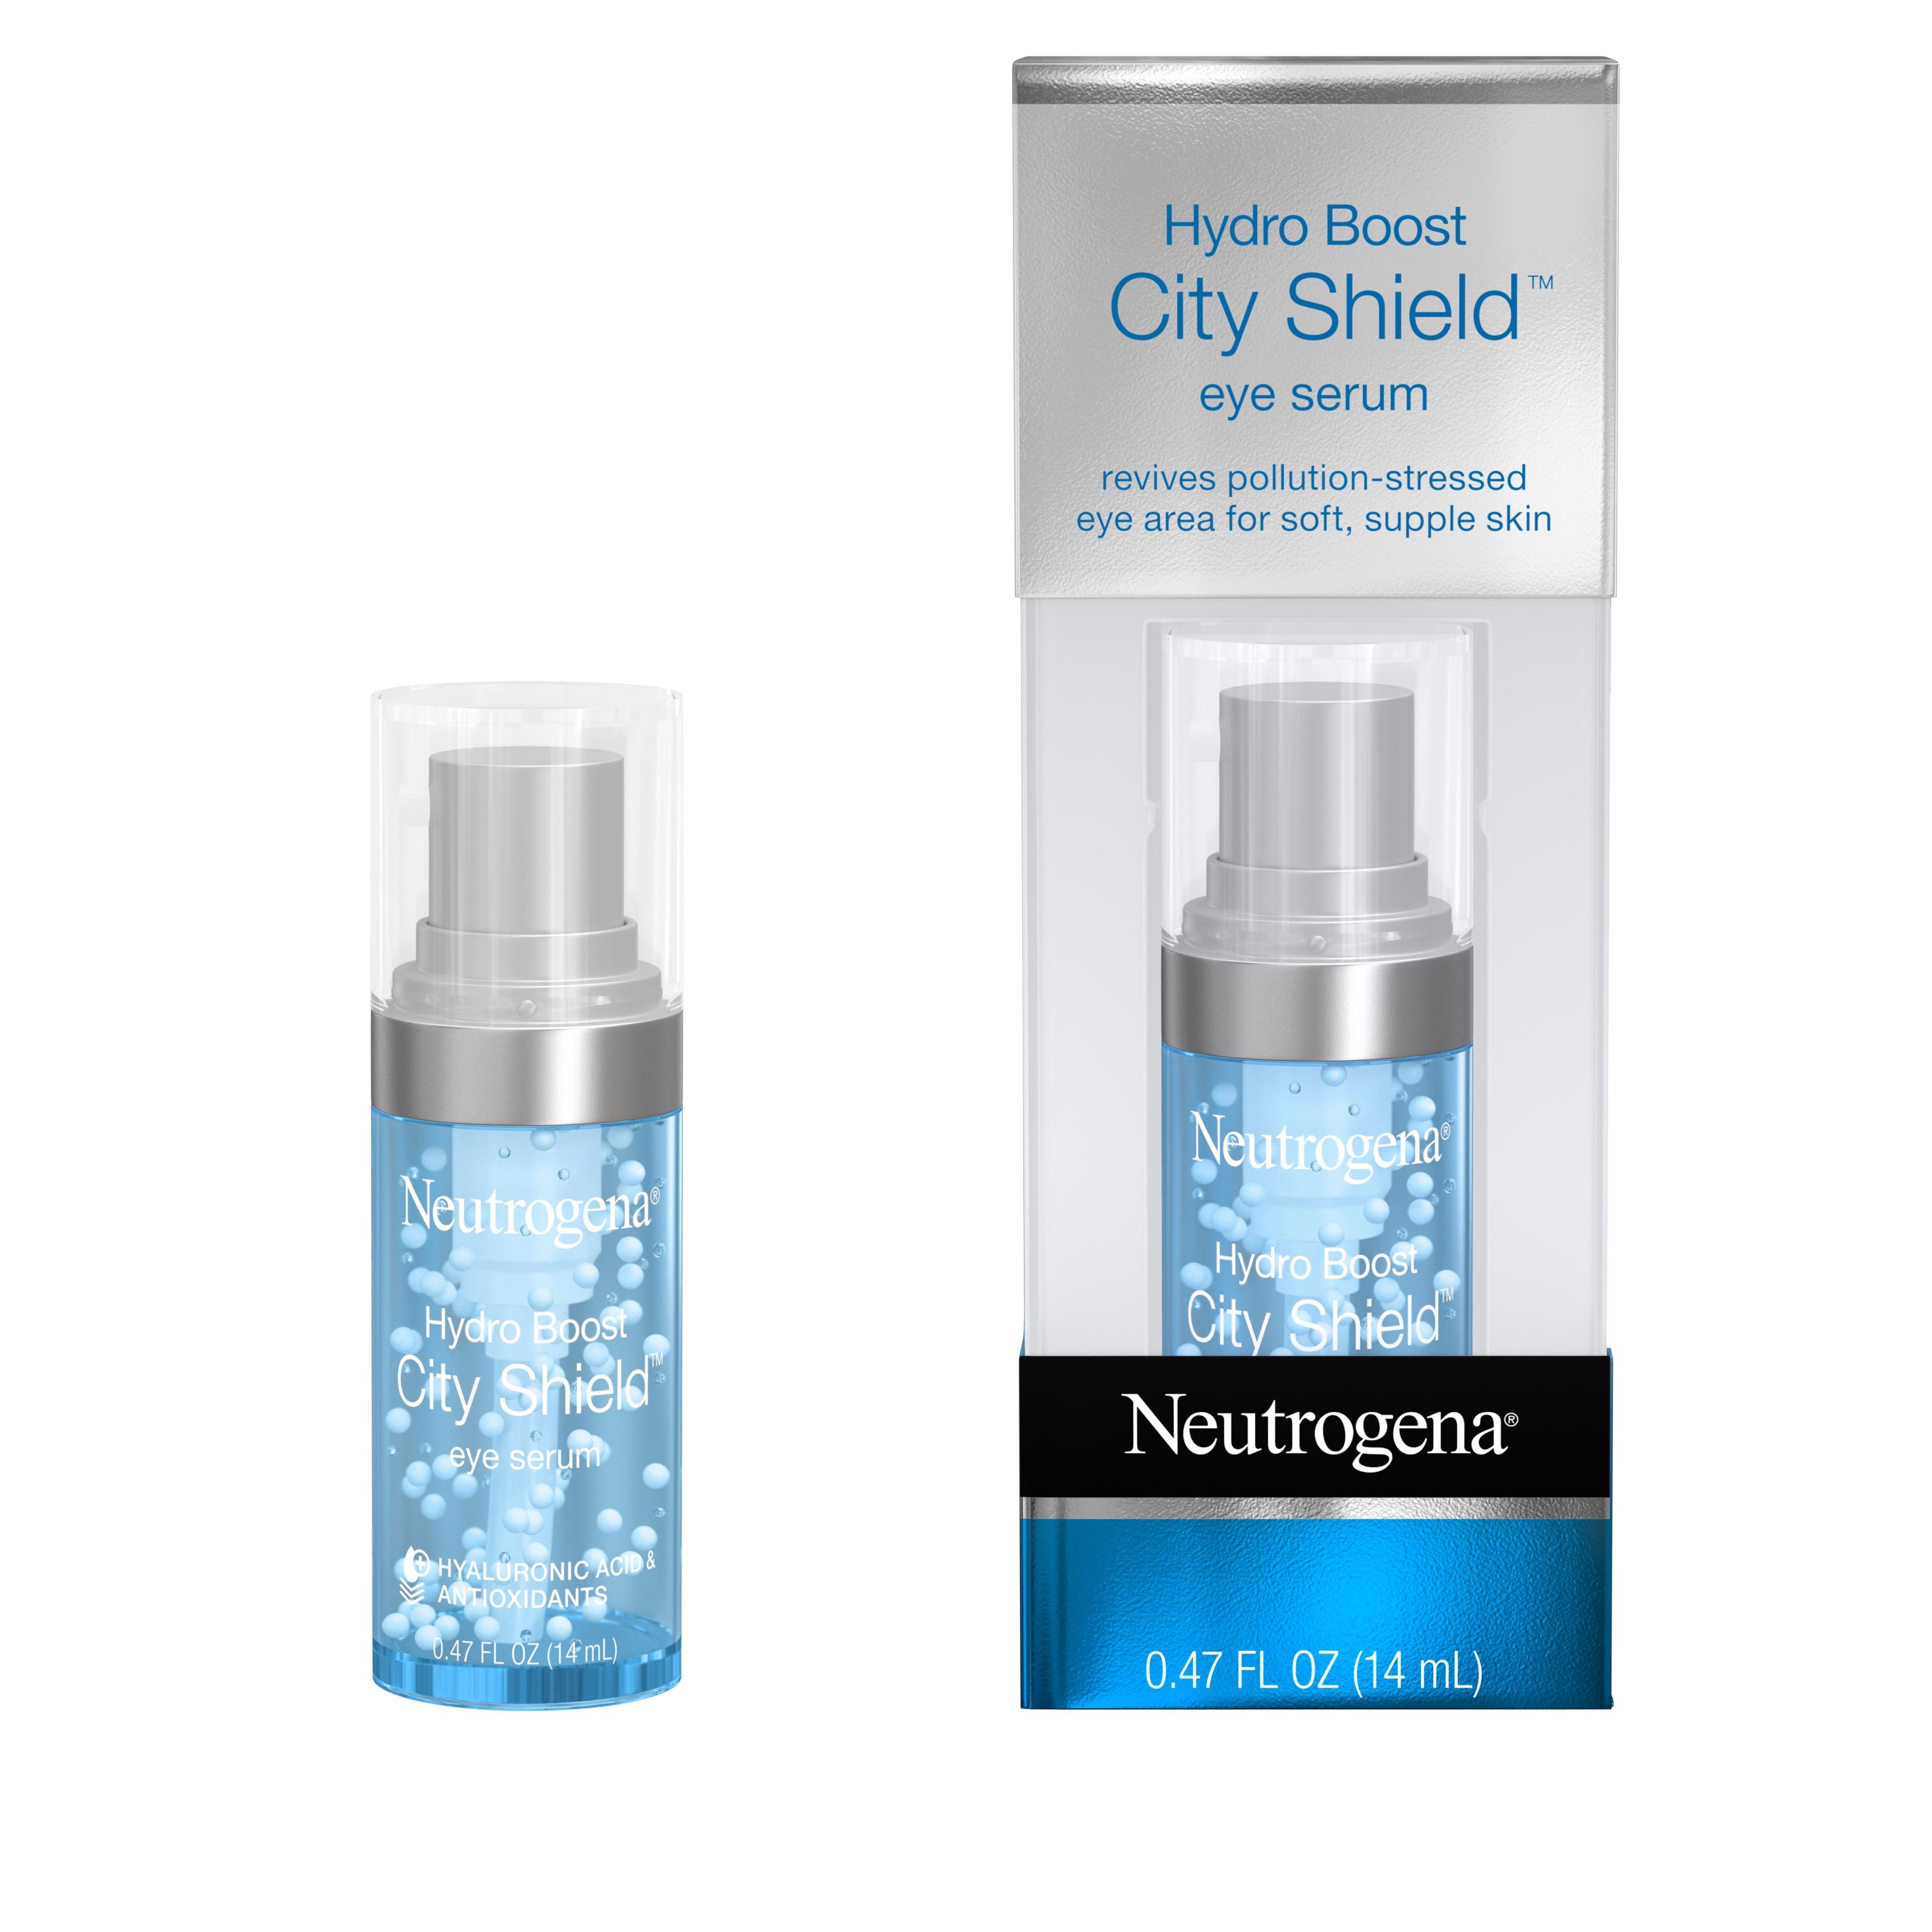 Neutrogena Hydro Boost City Shield Hydrating Eye Serum,.47 fl. oz